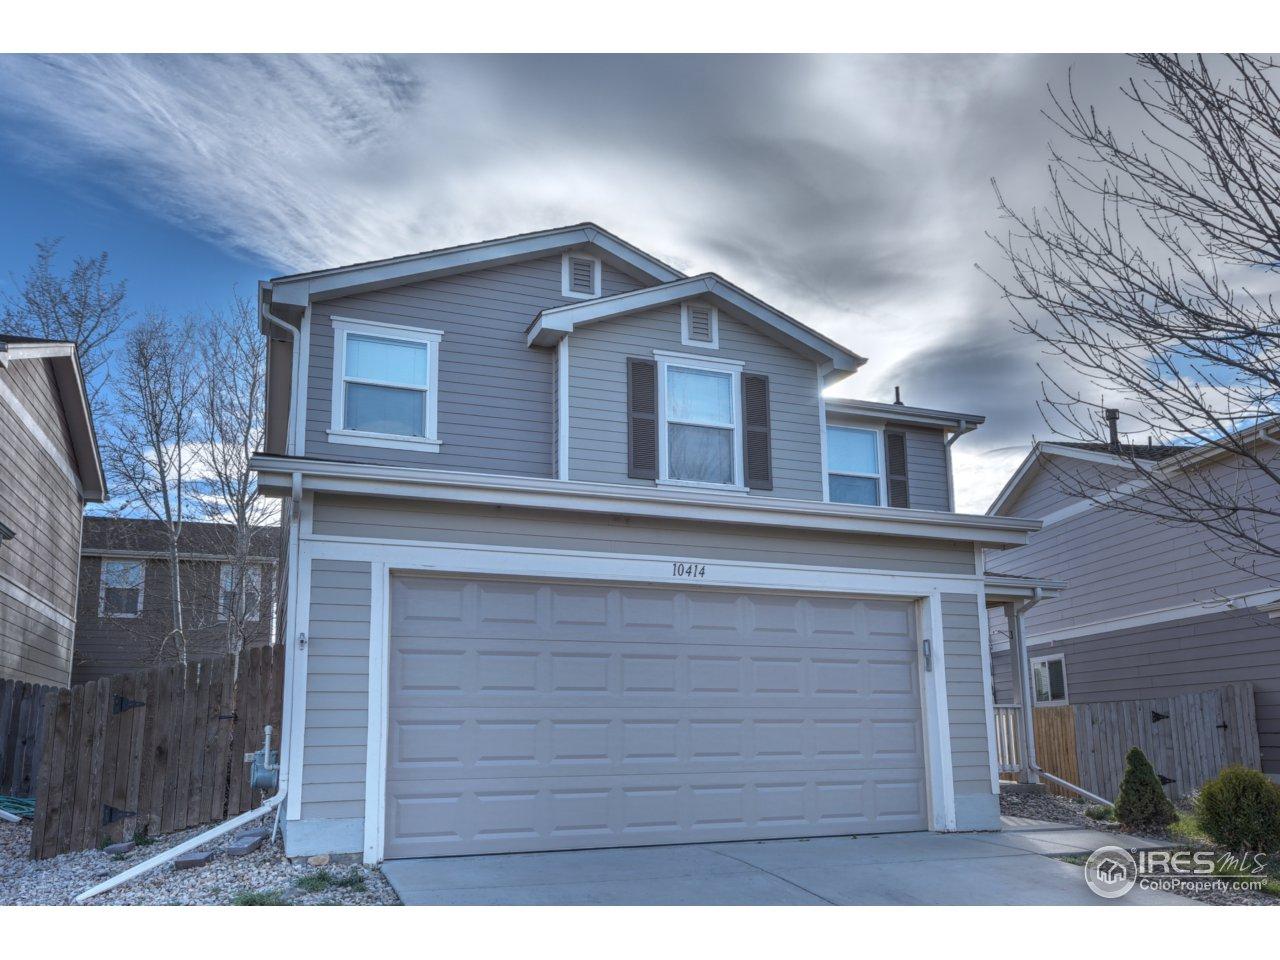 10414 Durango Pl, Longmont CO 80504